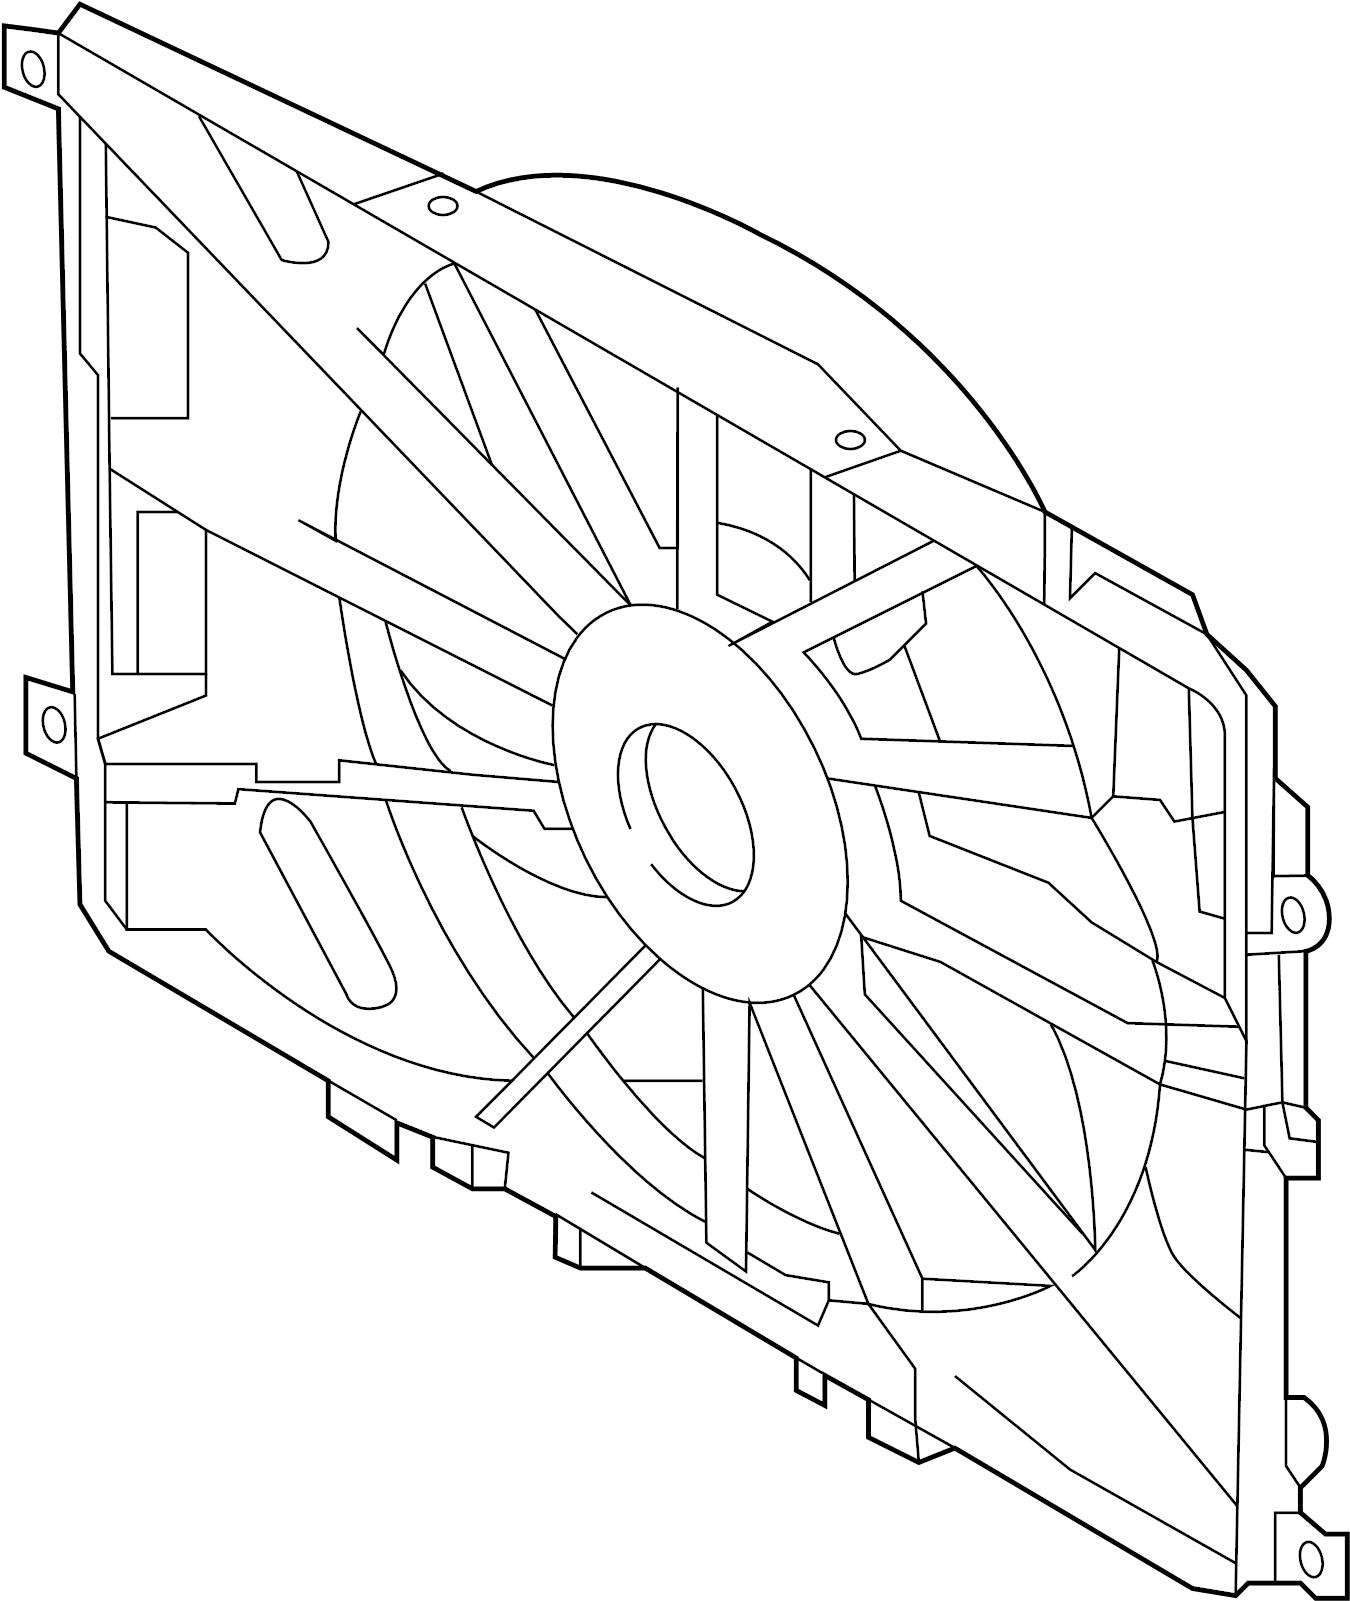 INFINITI I30 Engine Cooling Fan Motor. SHROUD, RADIATOR